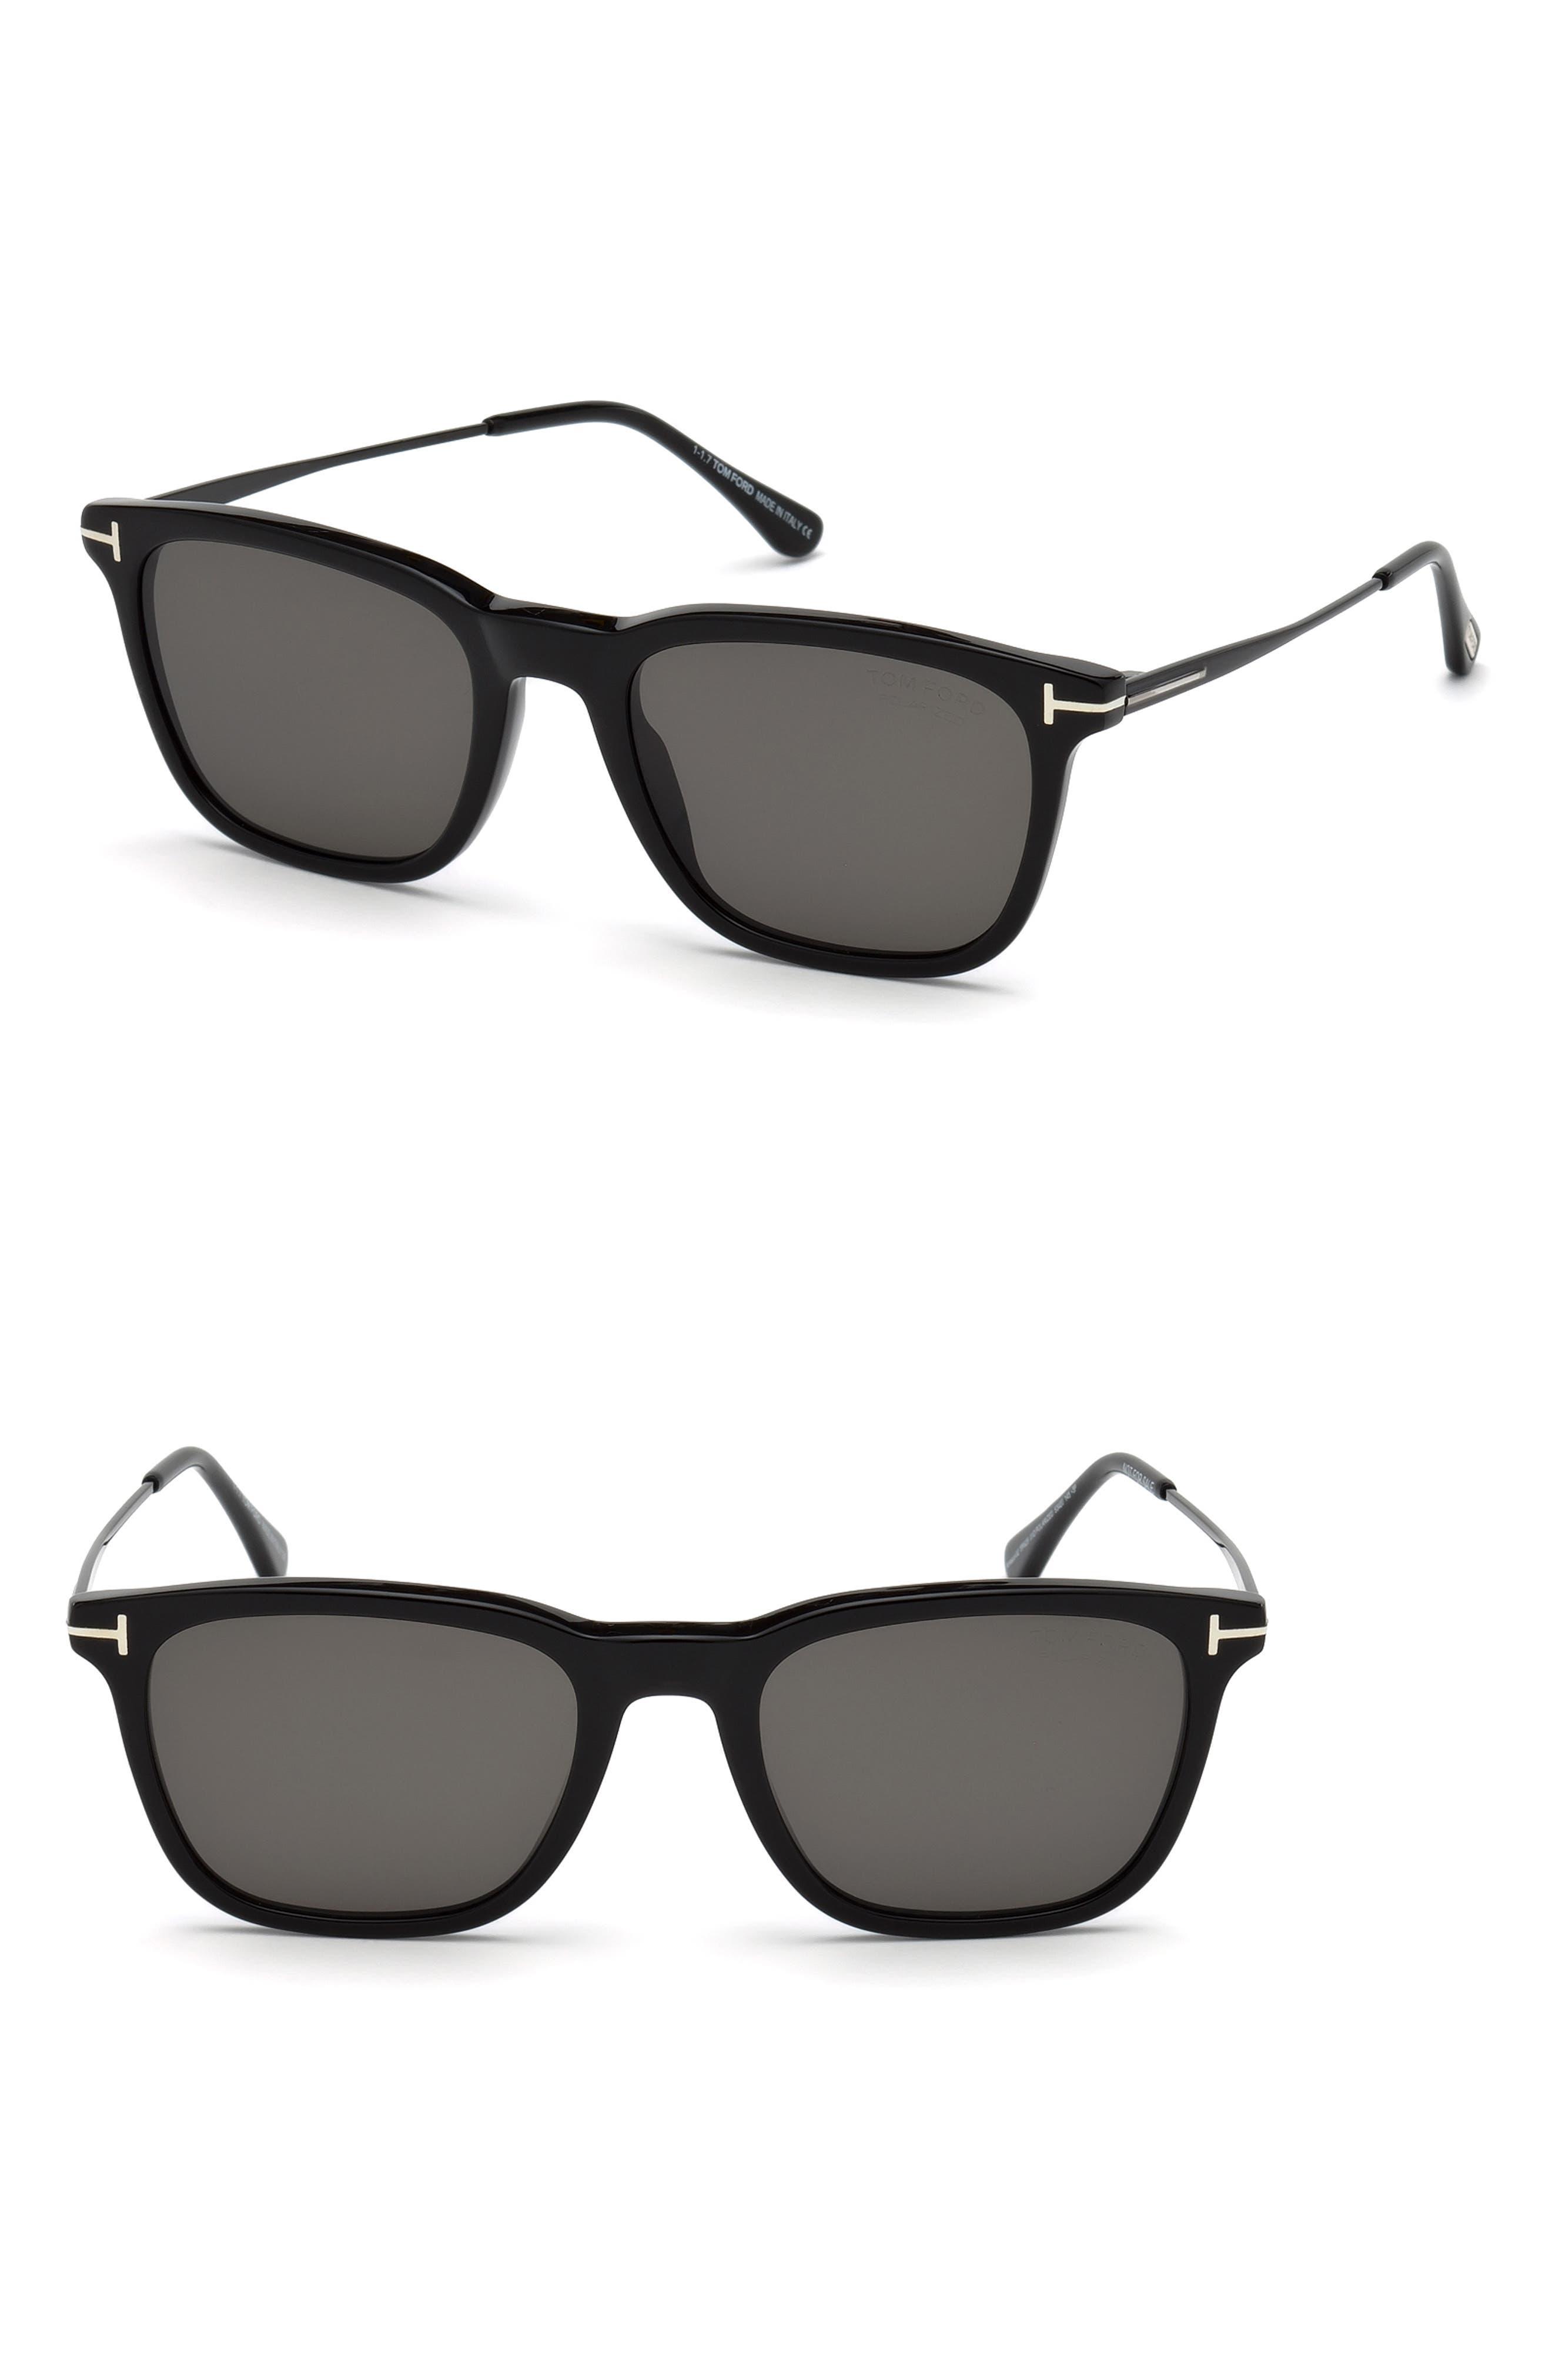 Tom Ford Arnaud 53mm Polarized Square Sunglasses Nordstrom